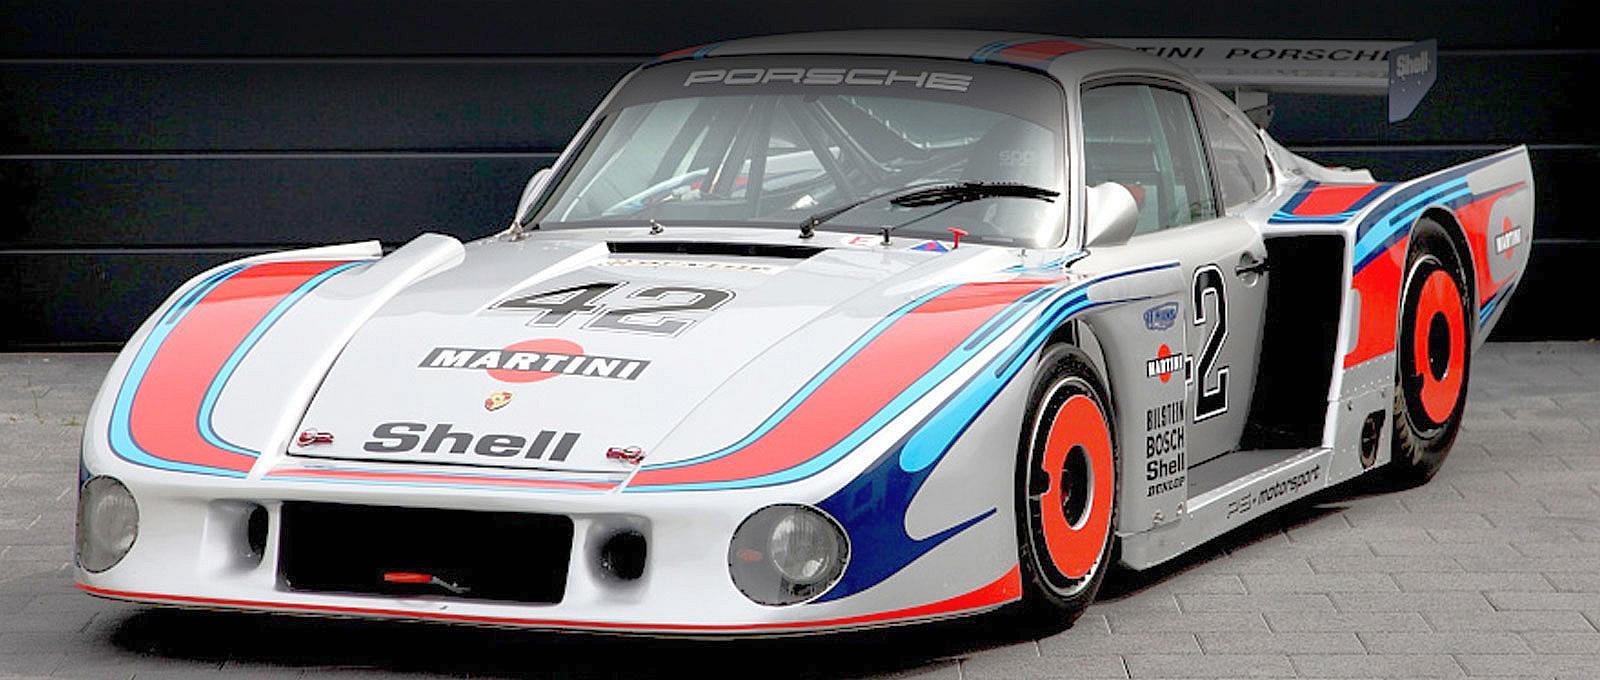 Porsche 935 K4 Martini